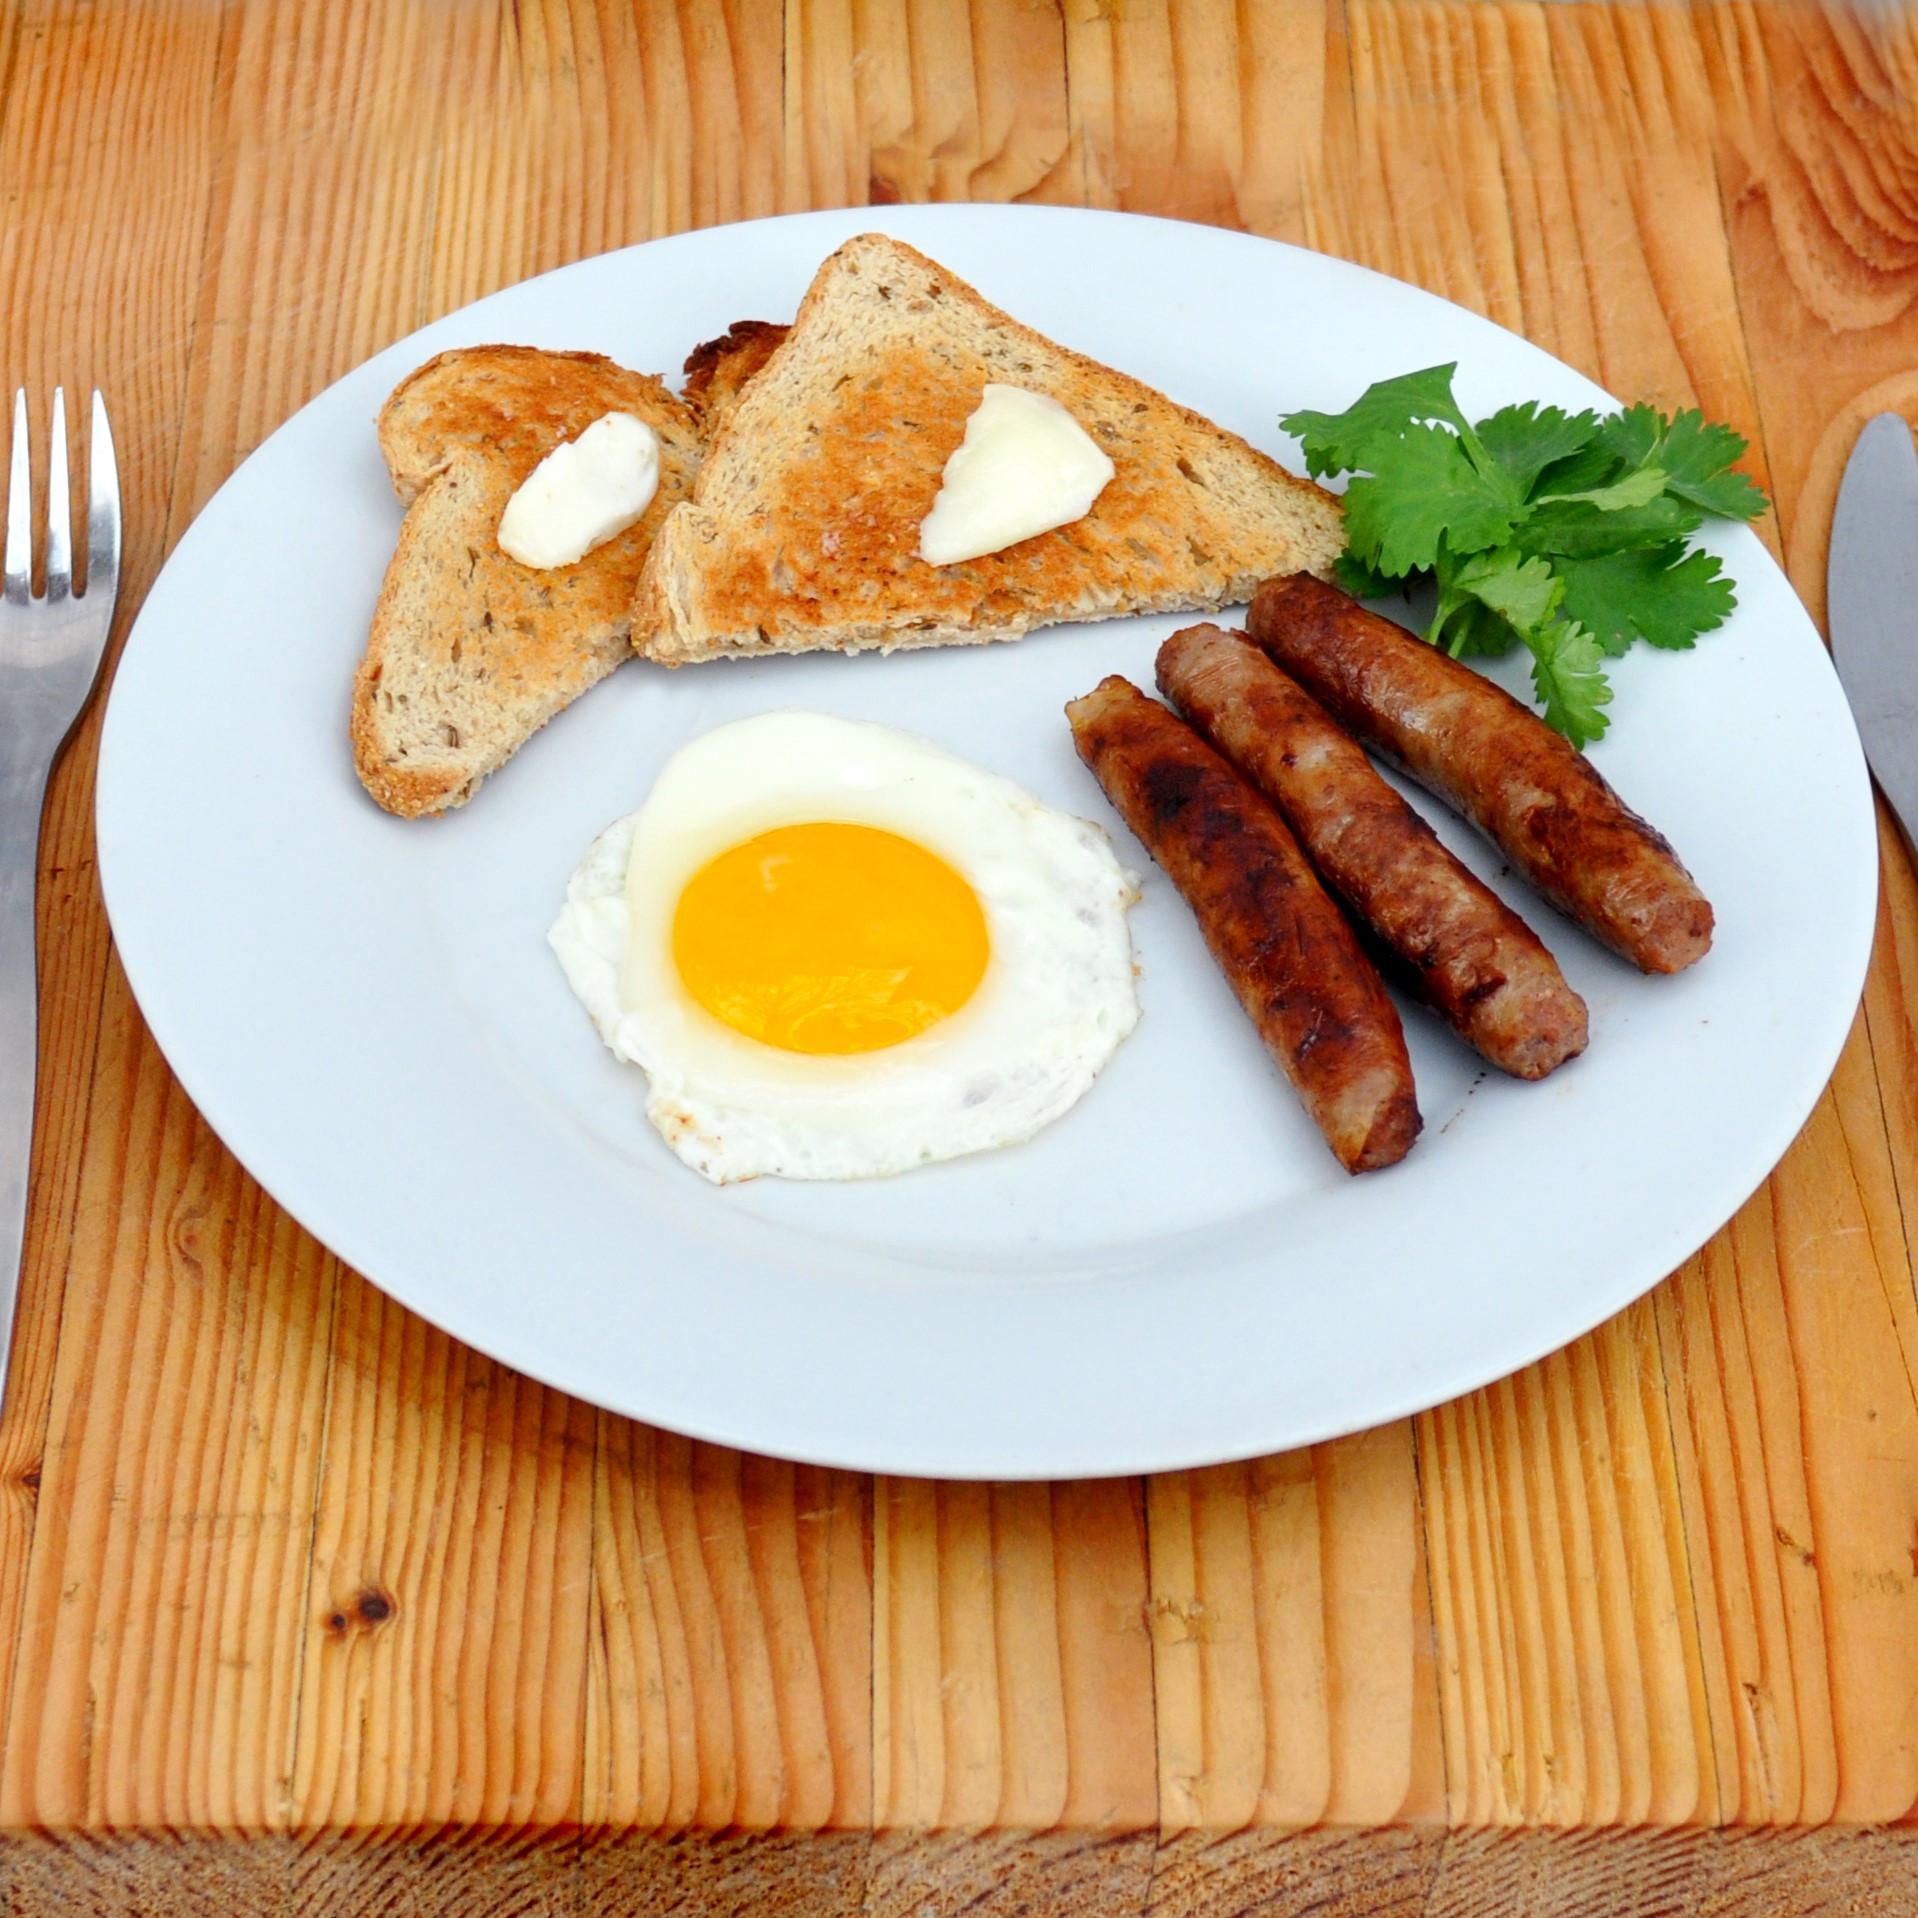 Pork - Breakfast Sausage Links